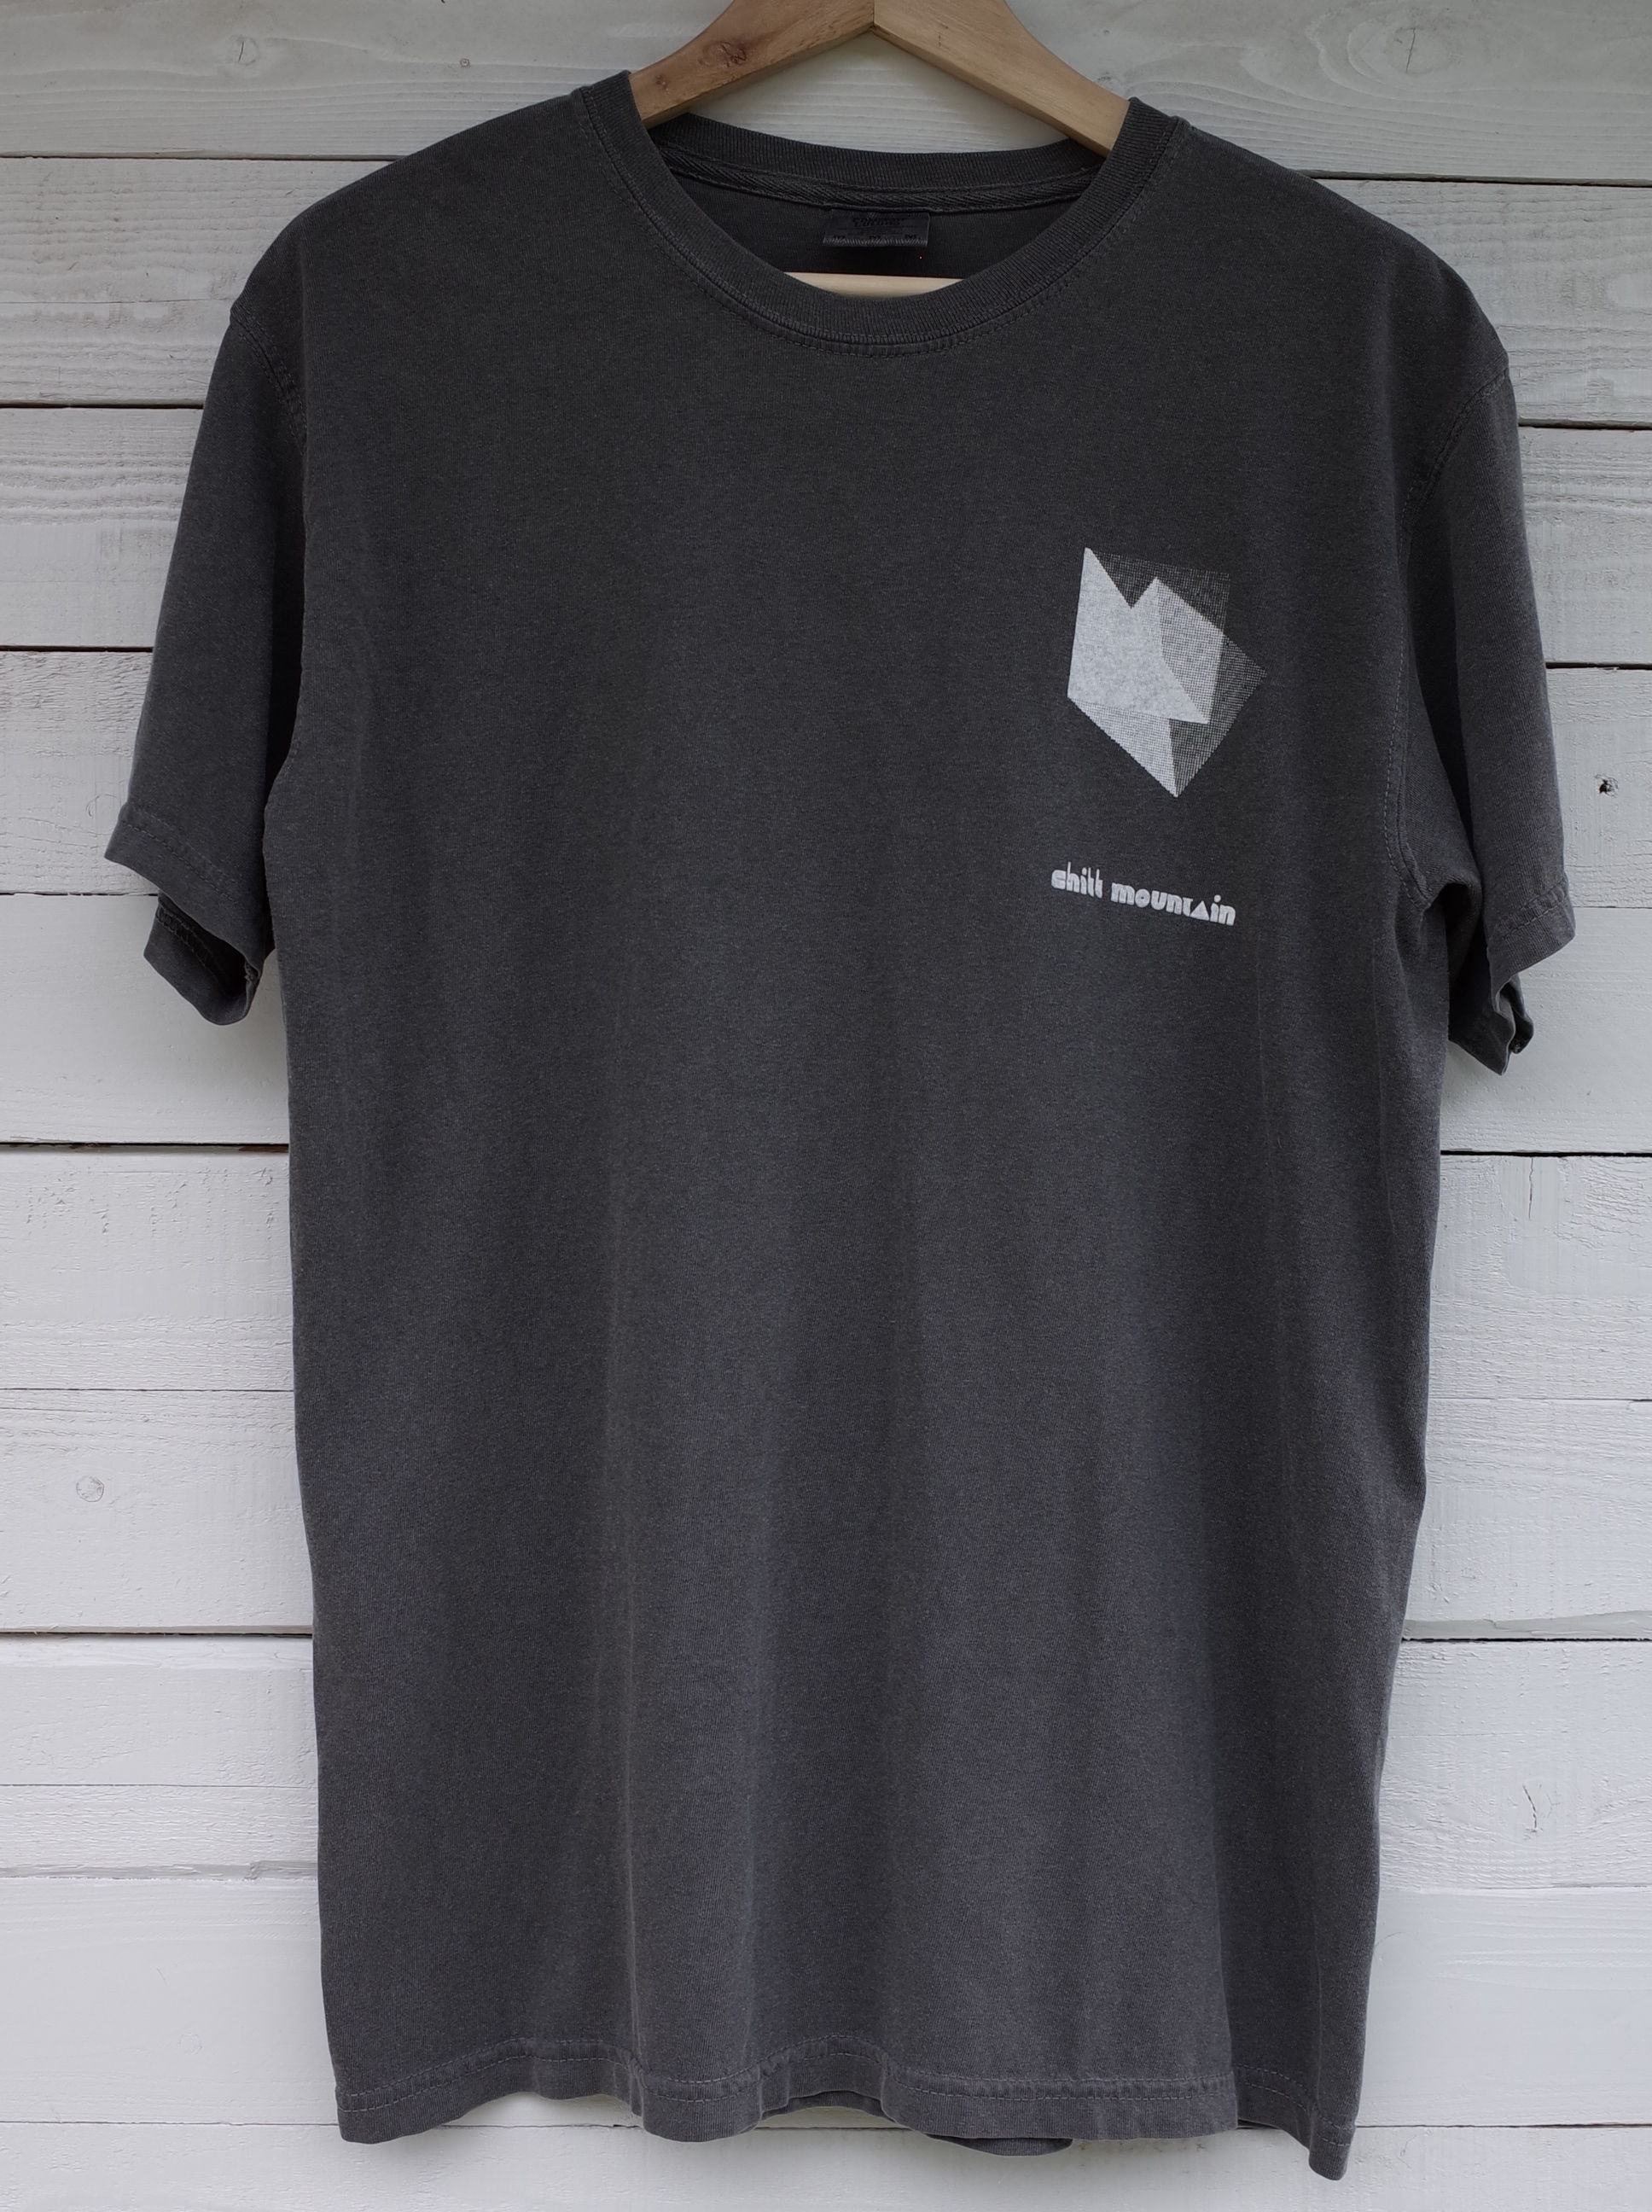 CHILL MOUNTAIN - chillmountain / Liquidanz T-shirts WashBlack Size XL : WEAR gallery 0